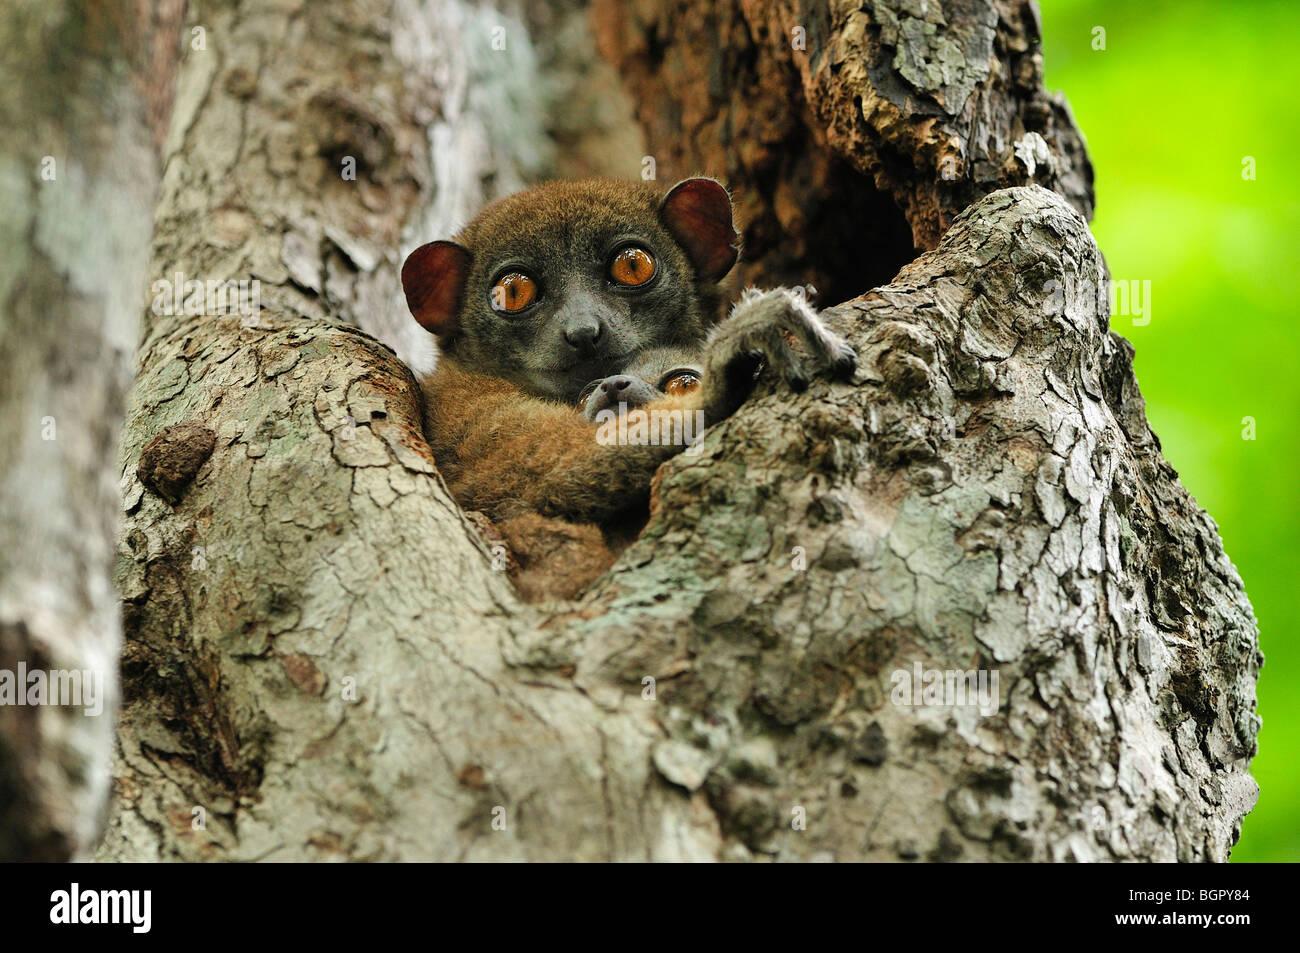 Ankarana Sportive Lemur (Lepilemur ankaranensis), female with baby in tree, Ankarana National Park, Northern Madagascar - Stock Image